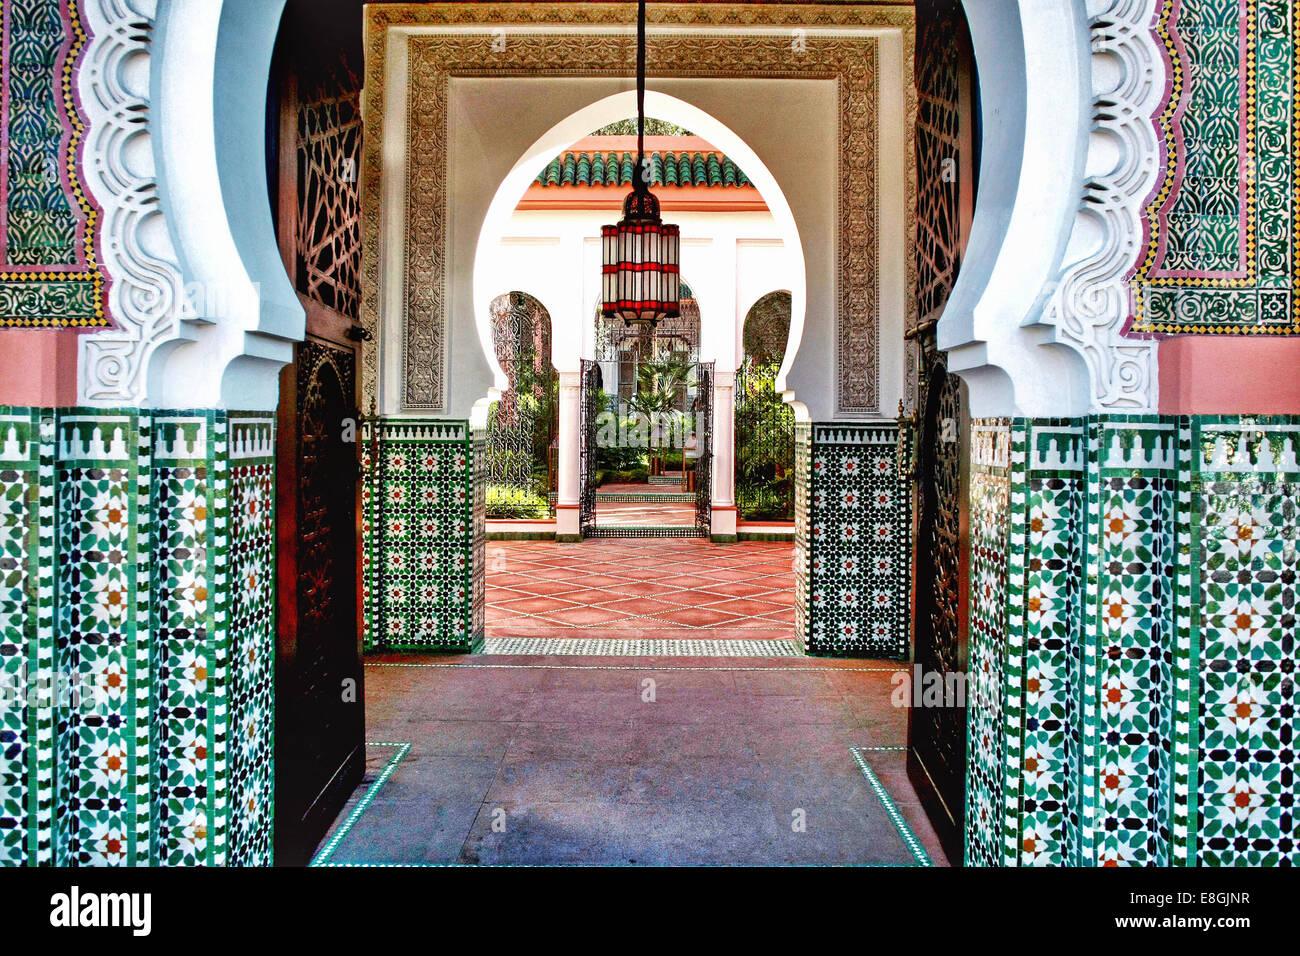 Morocco, Marrakesh-Tensift-El Haouz, Province Marrakesh, Marrakesh, Hotel interior with archway Stock Photo